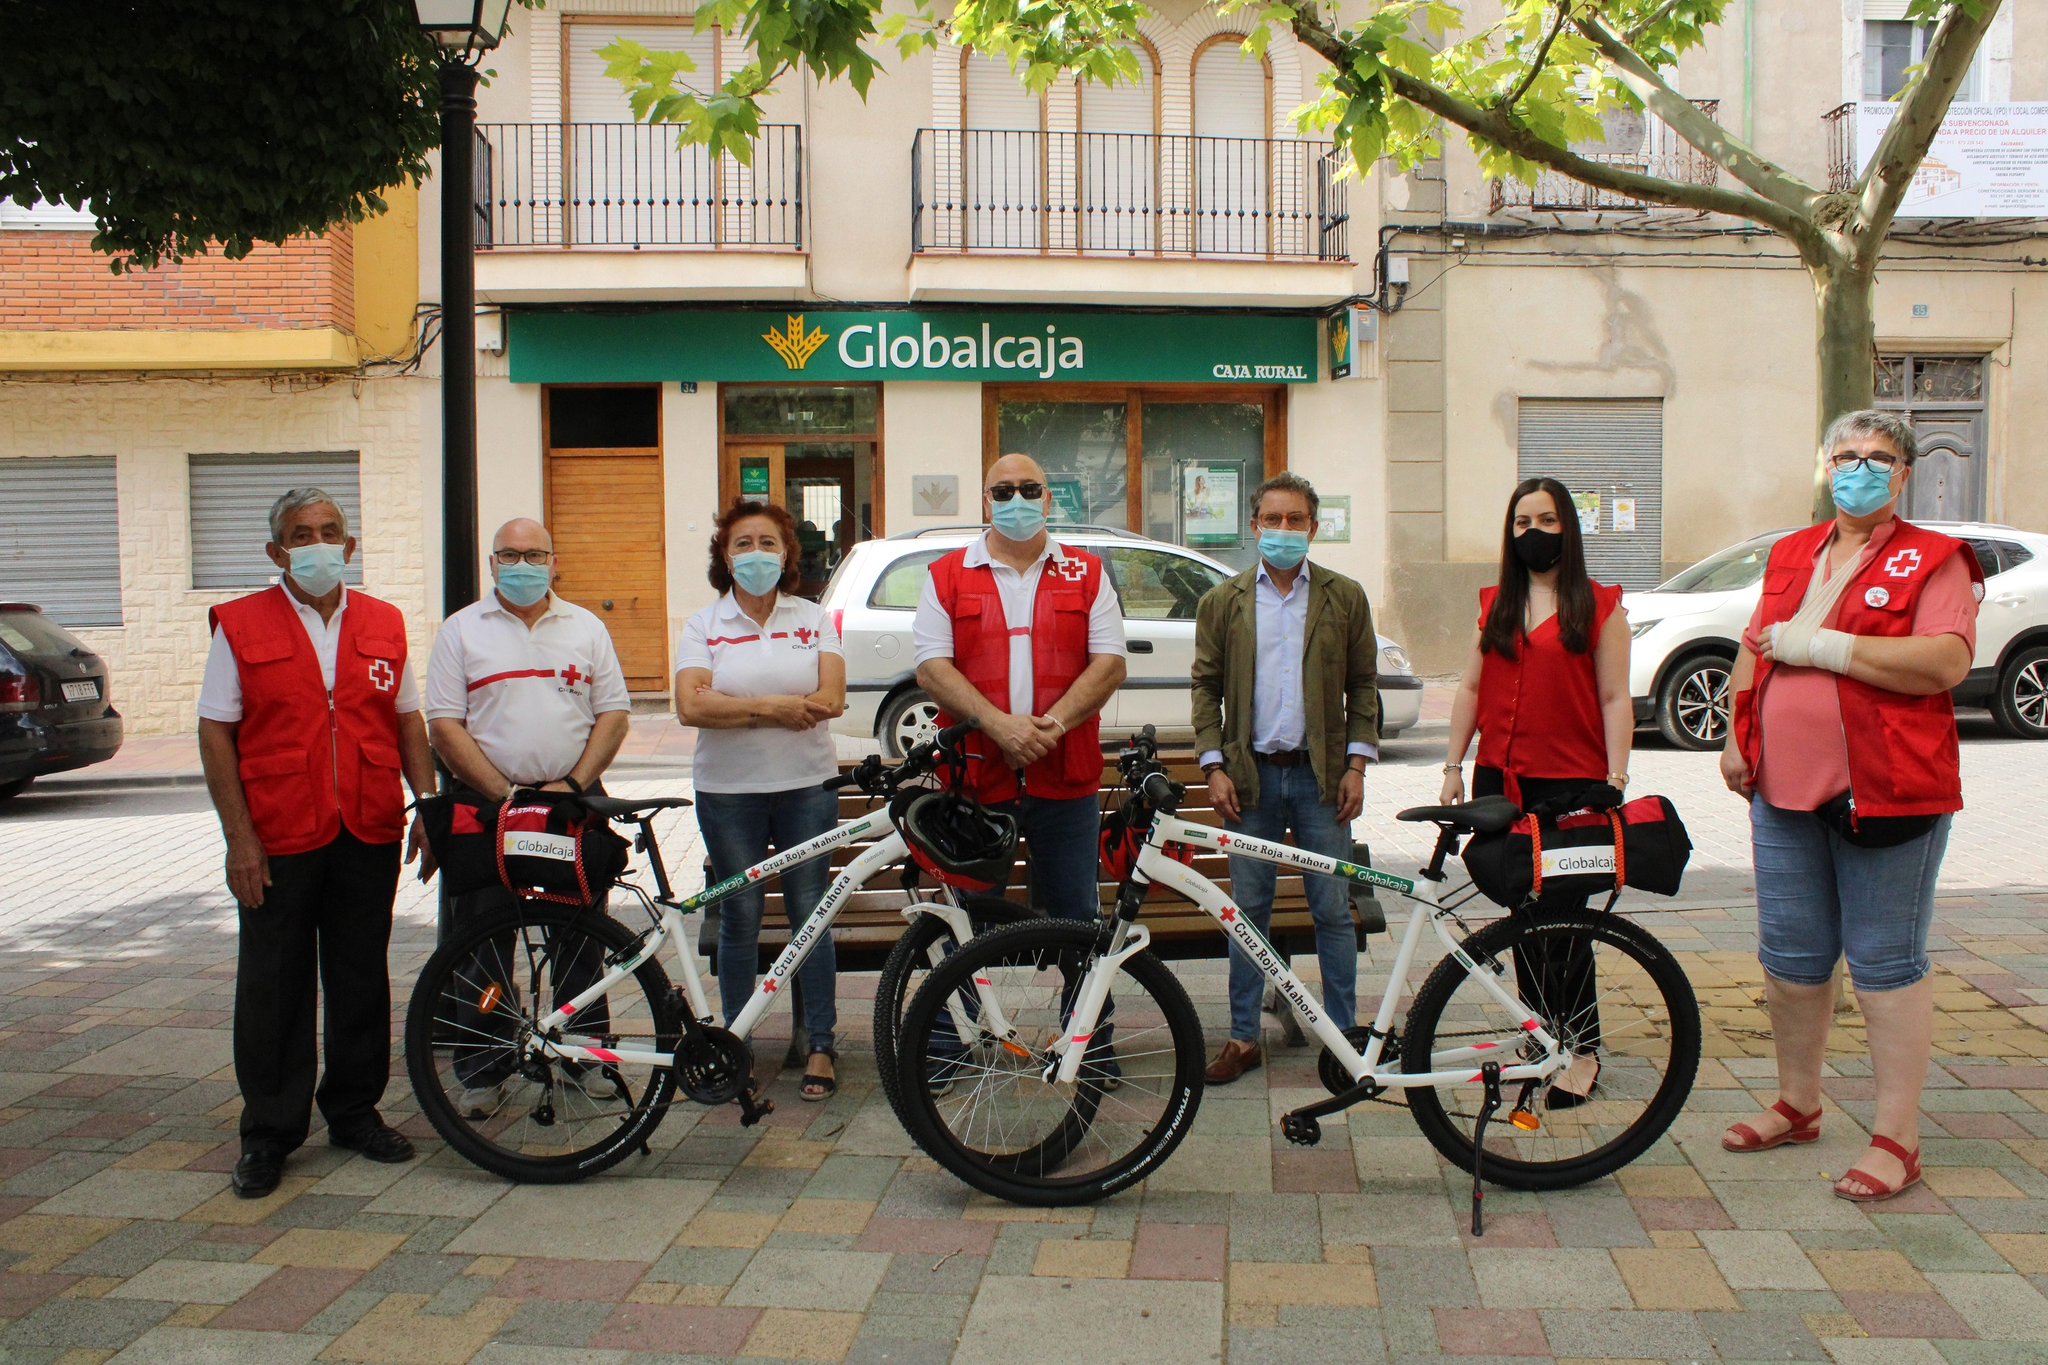 https://blog.globalcaja.es/wp-content/uploads/2020/07/entraga-bicis-cruz-roja-medicalizadas-mahora.jpg